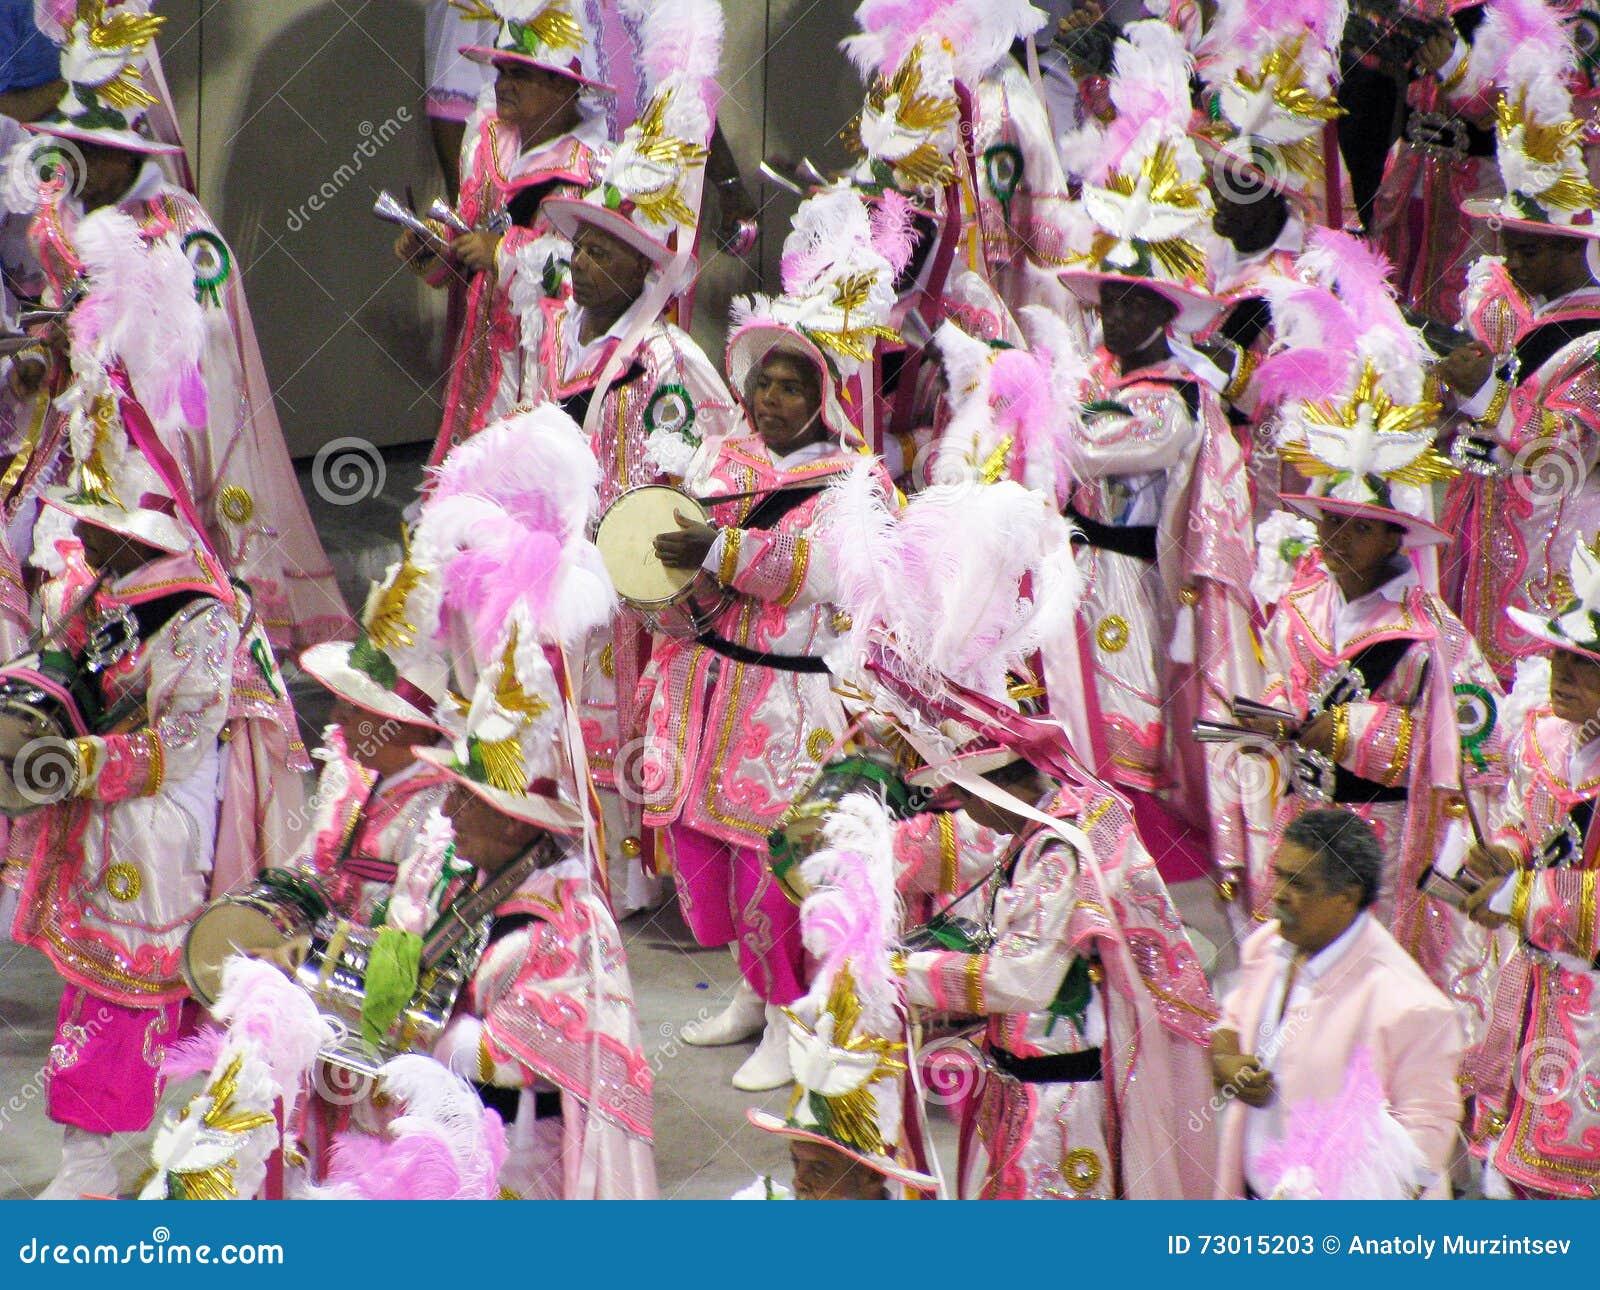 Amazing extravaganza during the annual Carnival in Rio de Janeiro